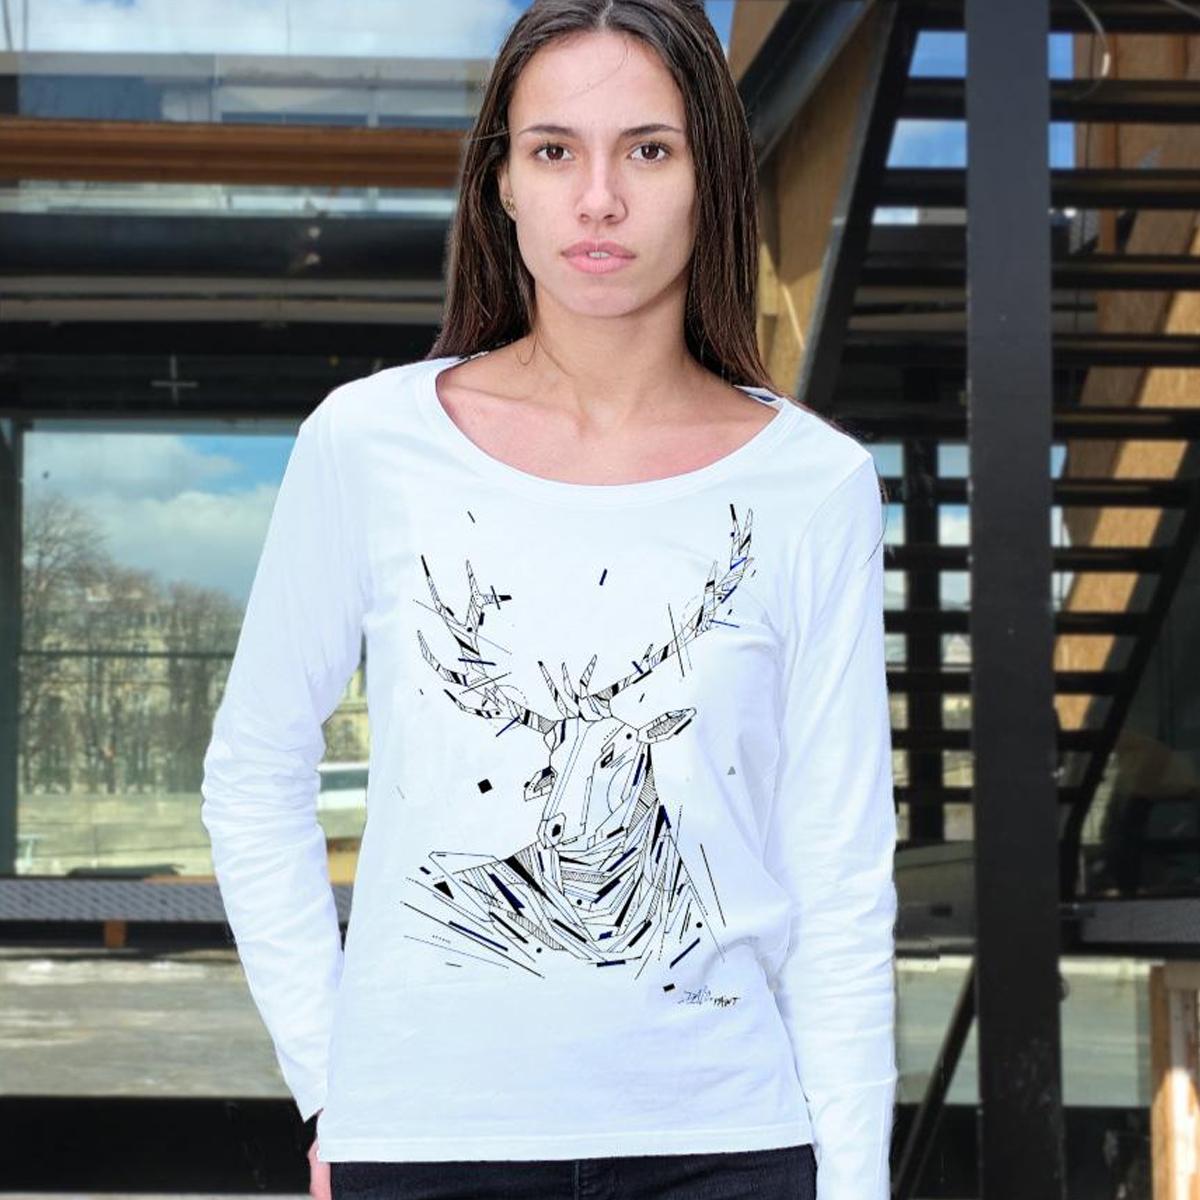 T-shirt Graffaune Graffiti cerf réalisé par Daco